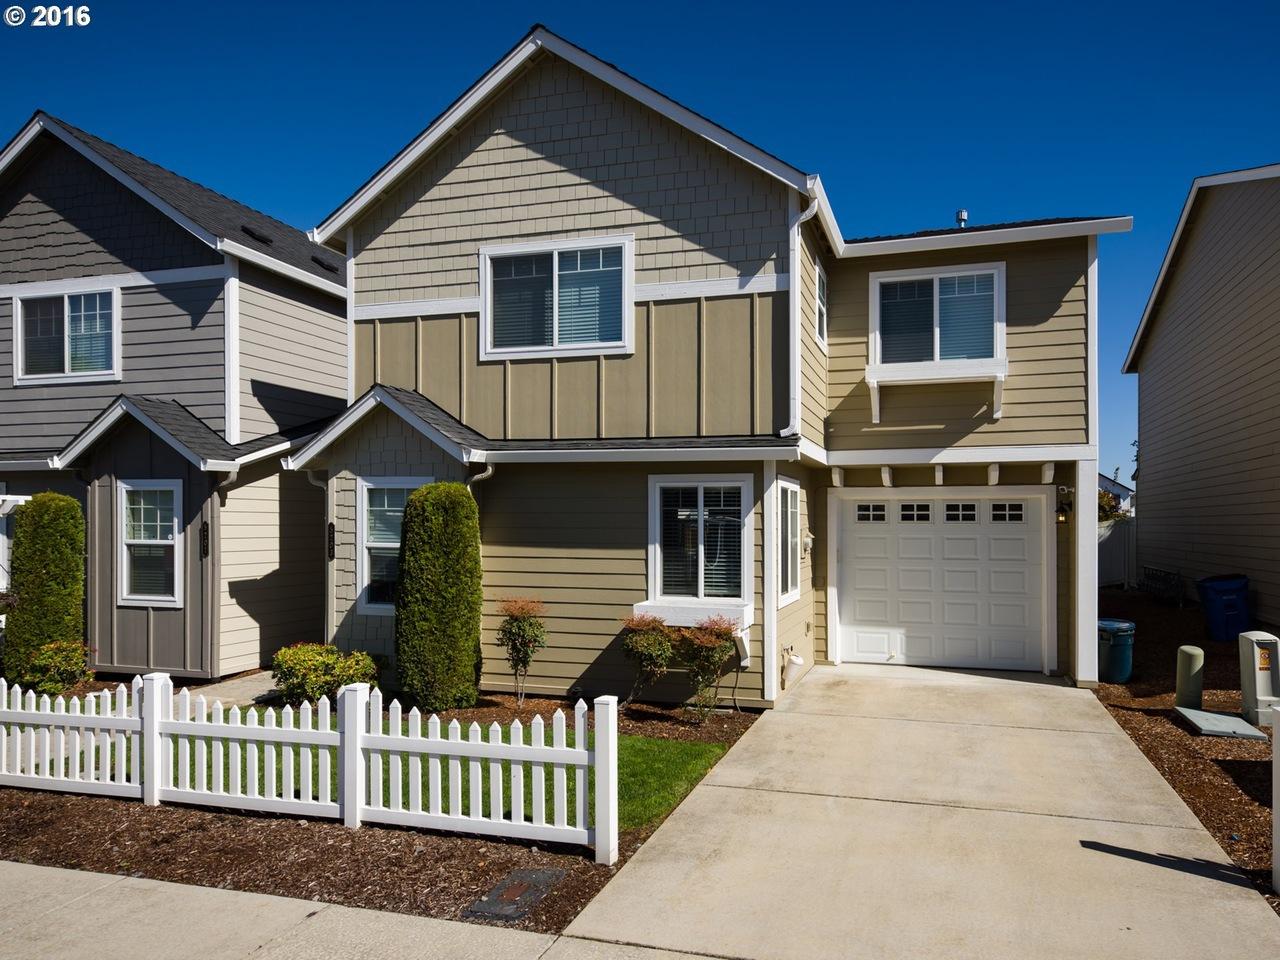 Creative Beach House Names Part - 37: 5203 NE 74th Ct, Vancouver, WA 98662   MLS# 16120568   Redfin